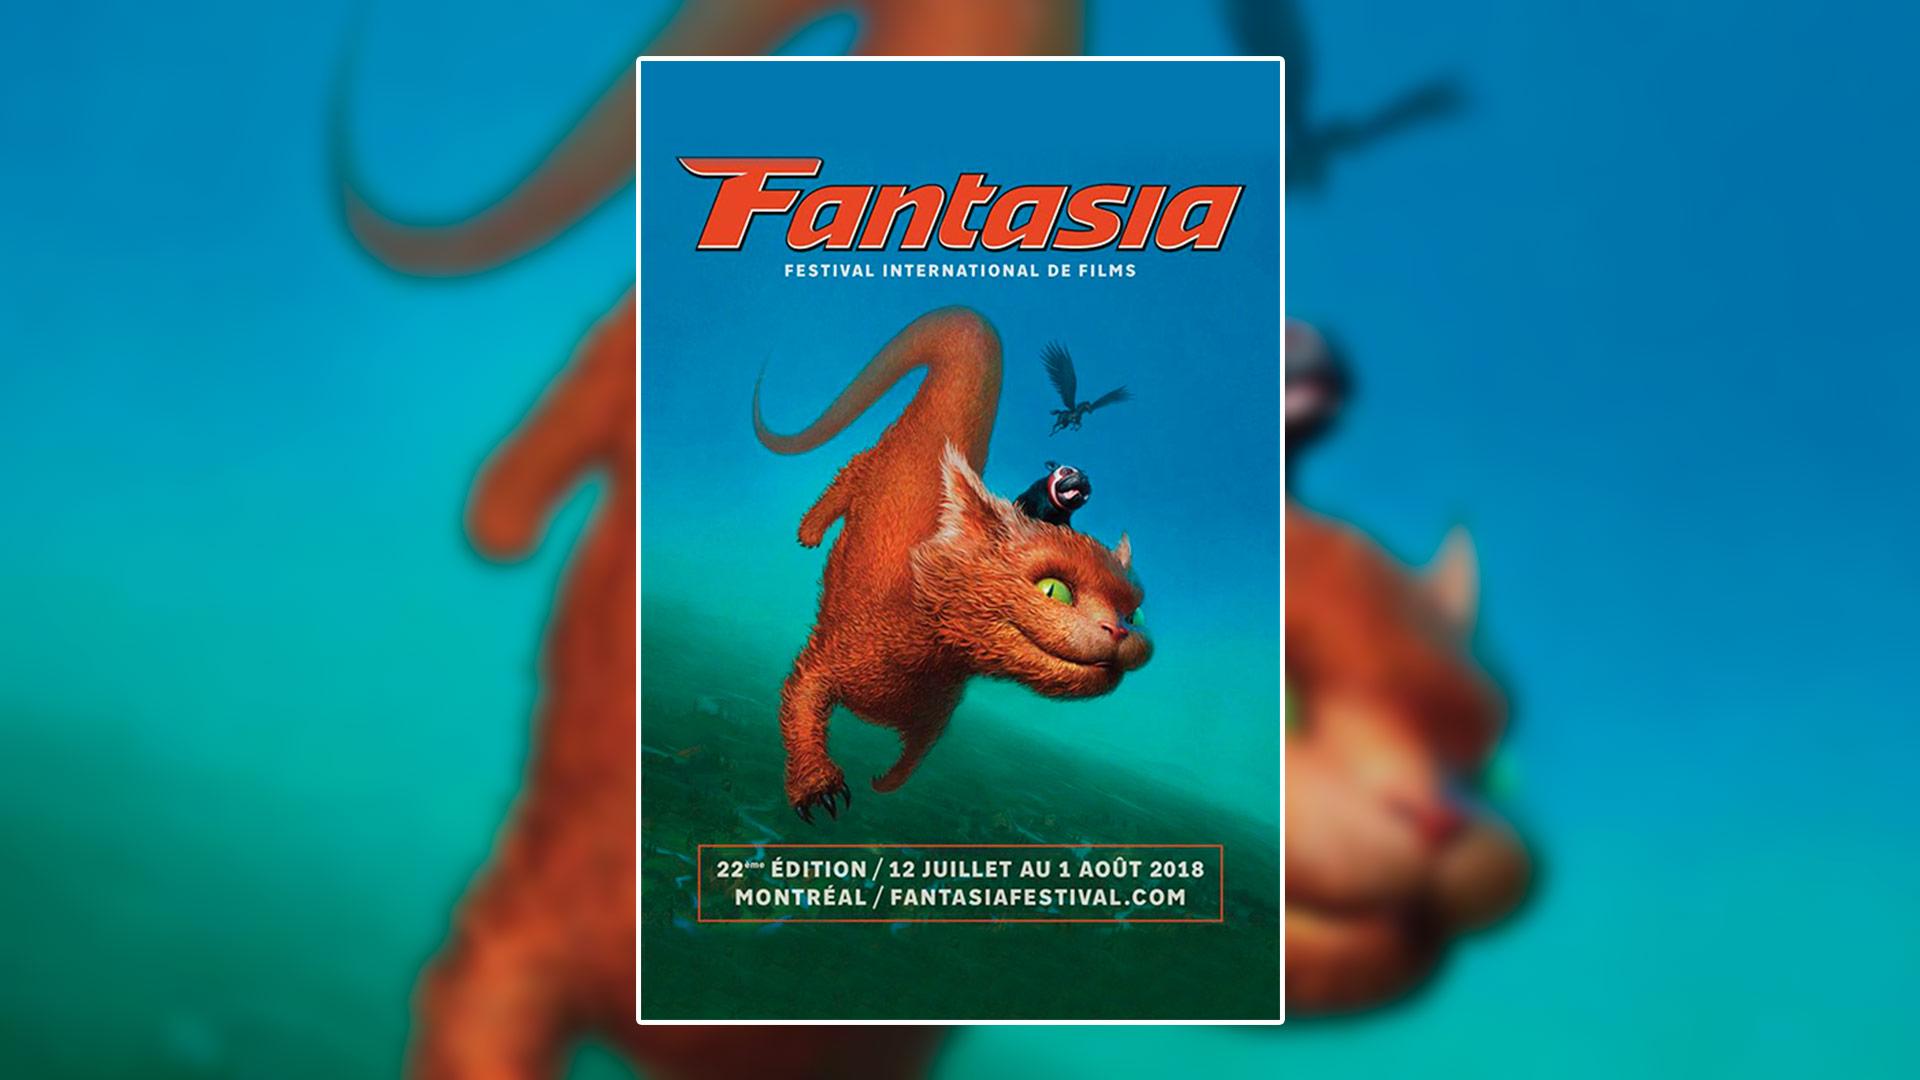 L'affiche Fantasia 2018